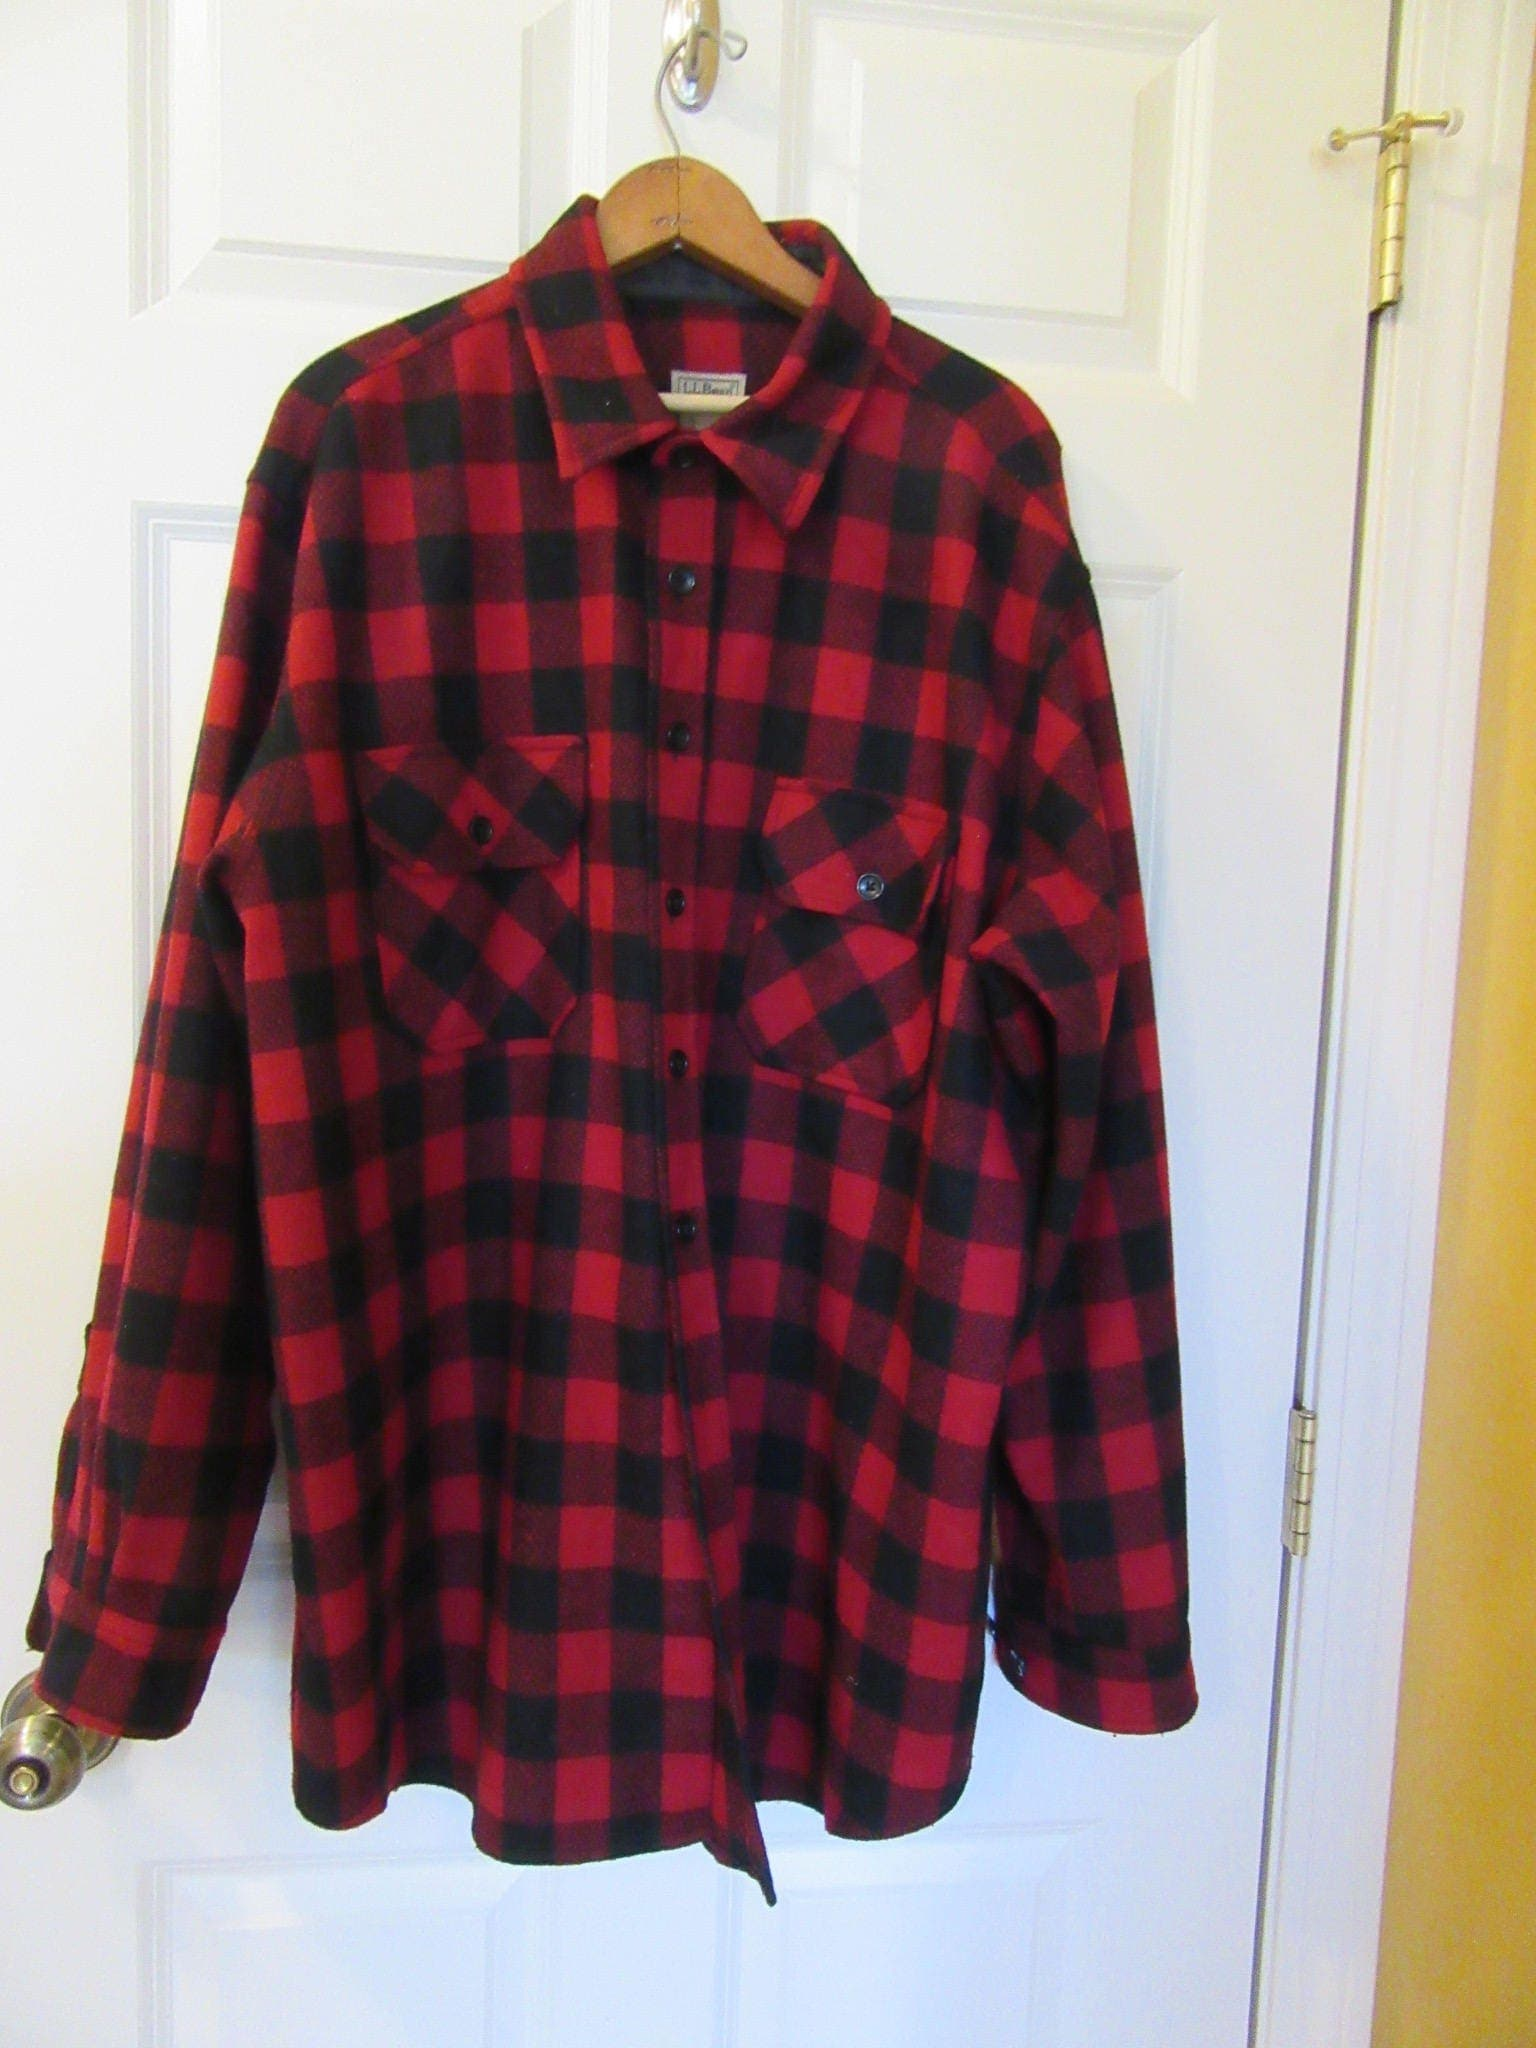 LL Bean wool plaid hunting shirt- Mens size XL- red and black plaid-